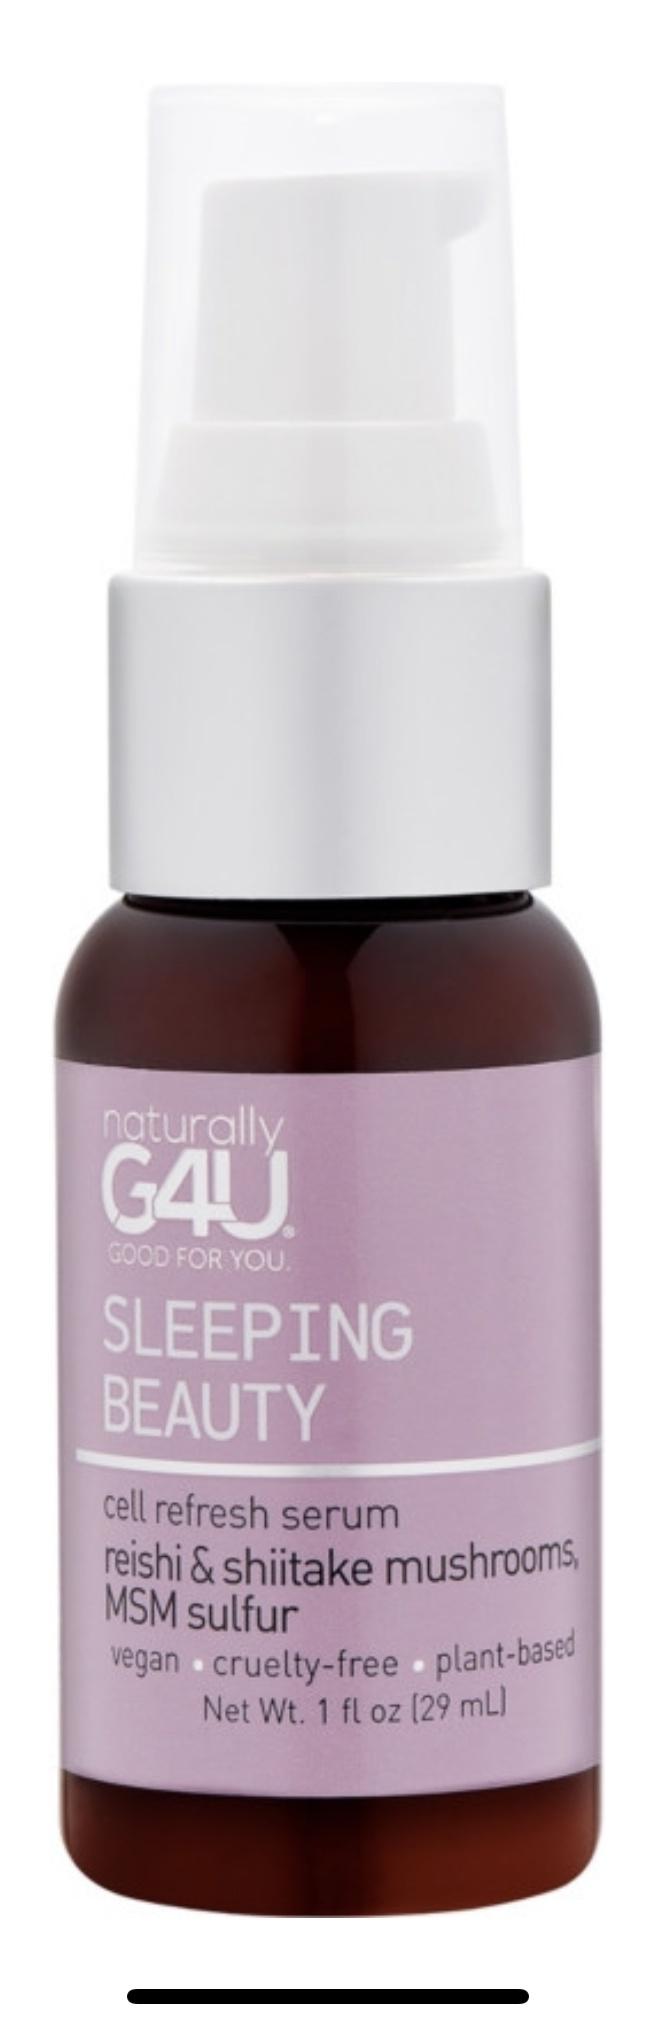 Naturally G4U Sleeping Beauty - Cell Refresh Serum